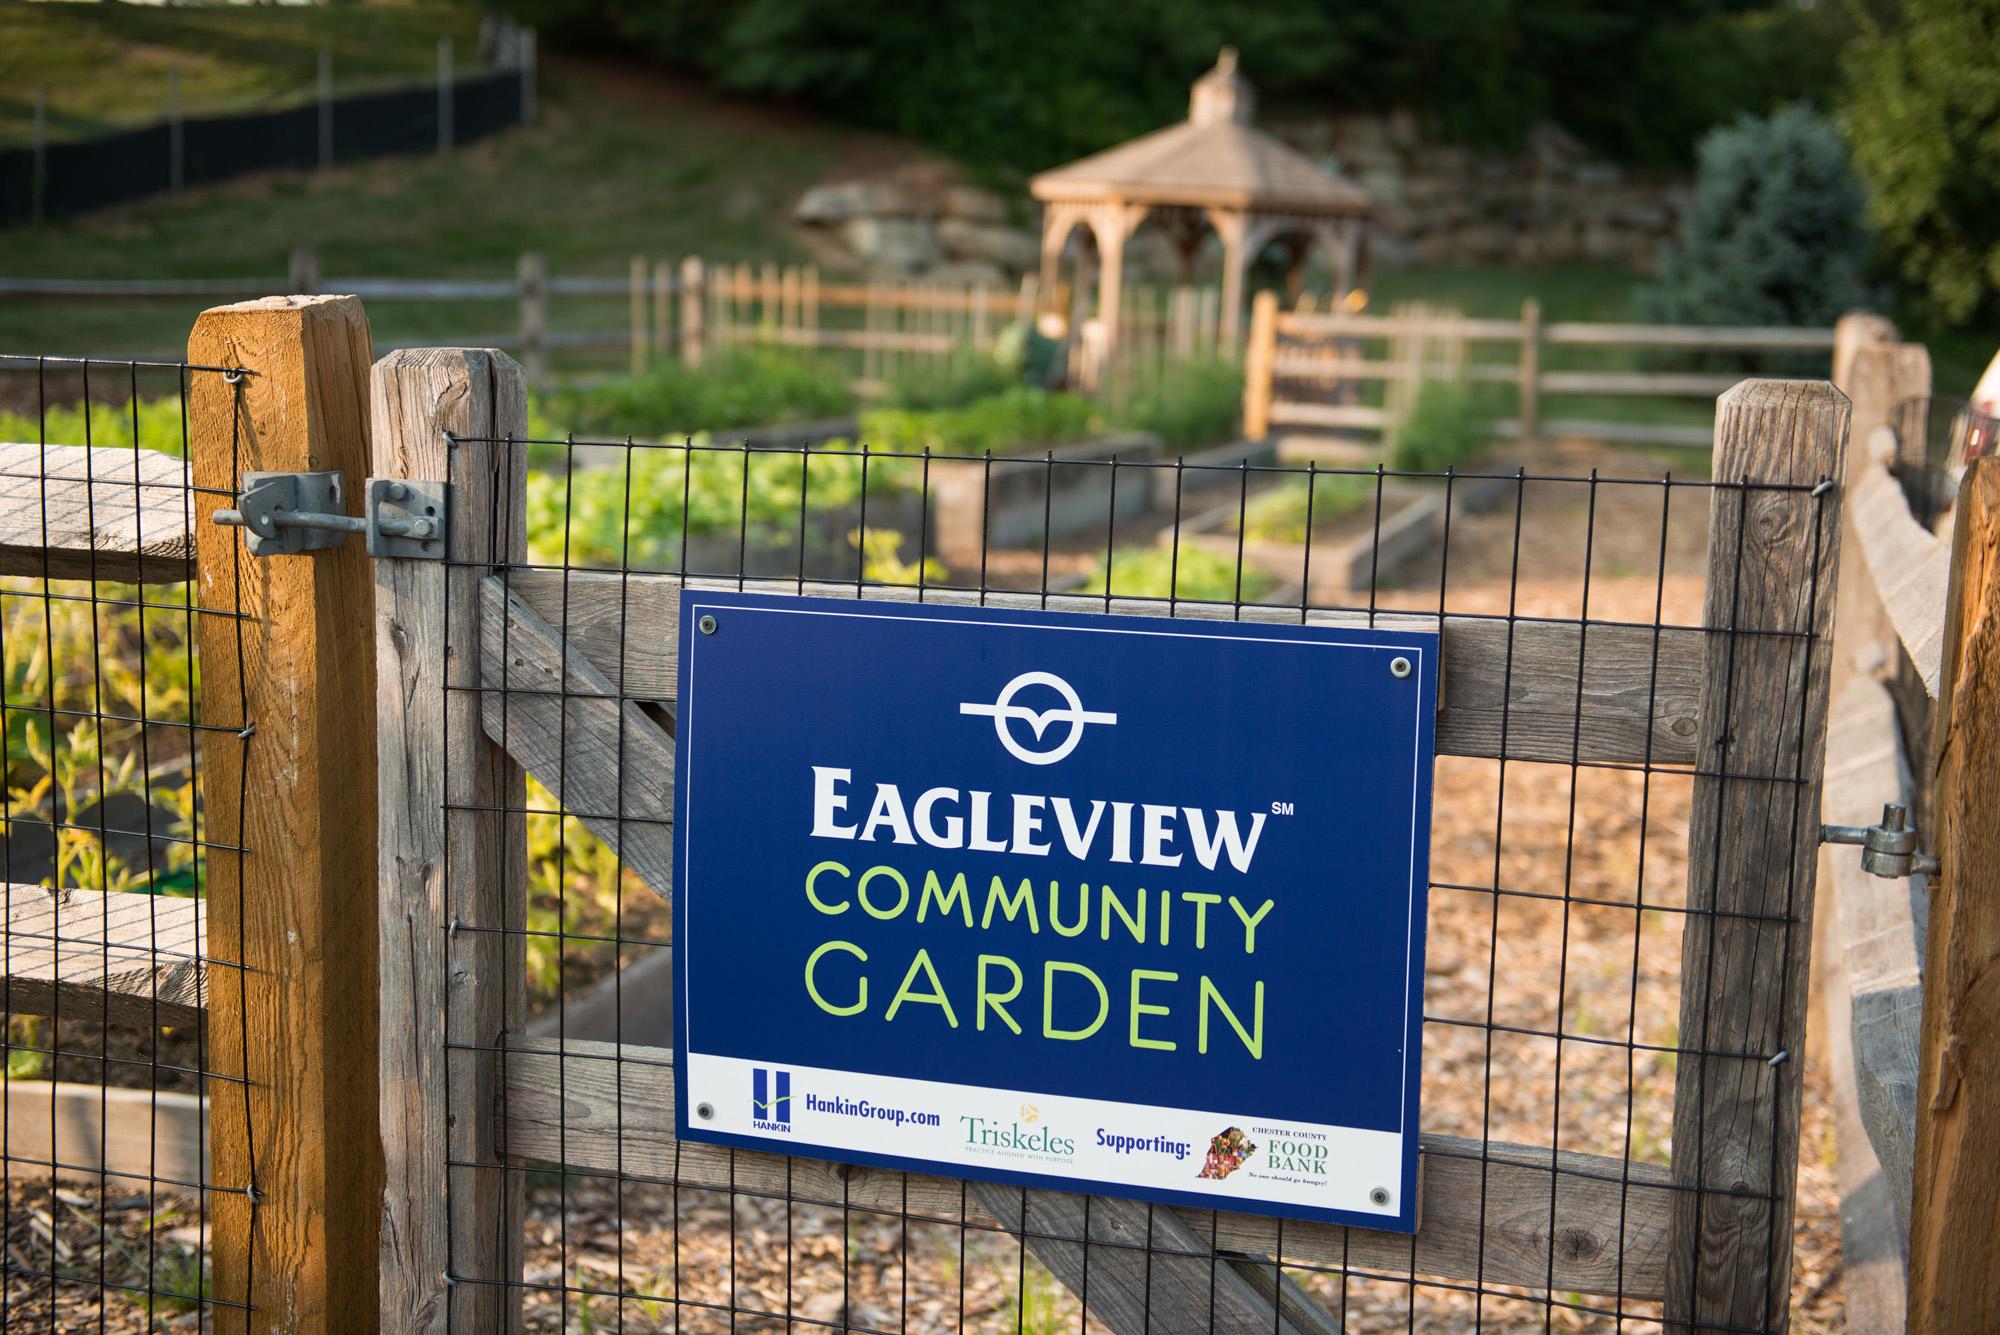 eagleview community garden